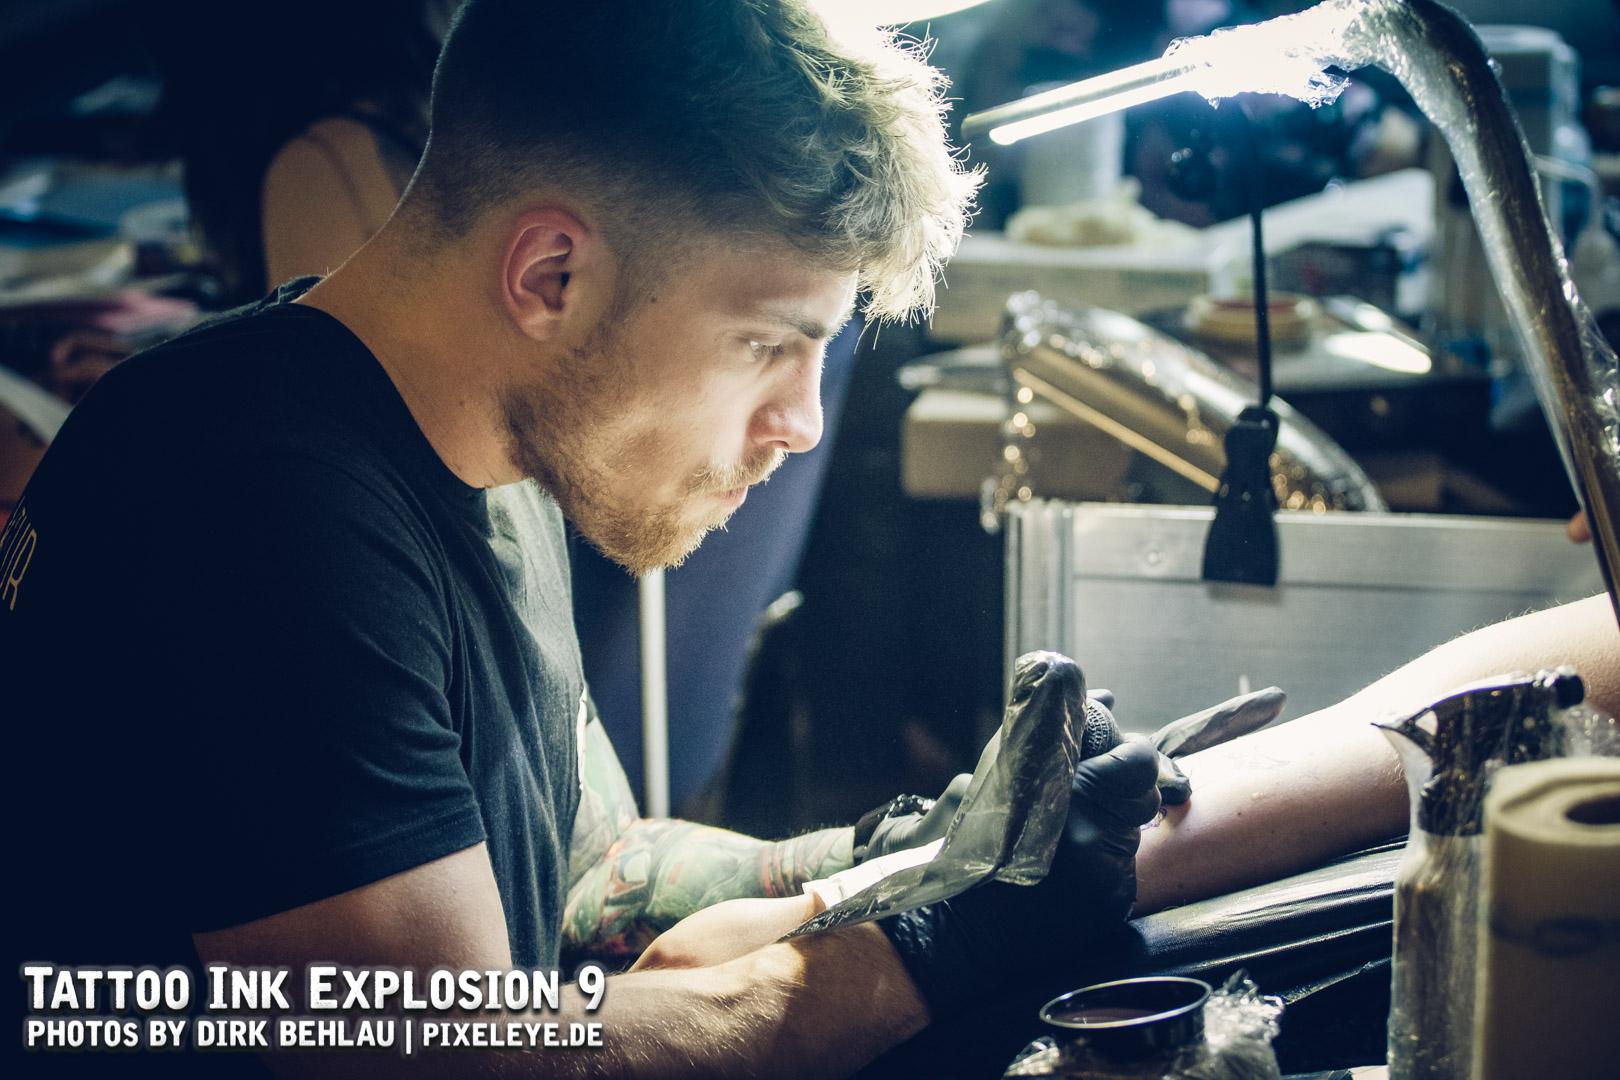 Tattoo Ink Explosion 2018 WEB by Dirk Behlau-1438.jpg